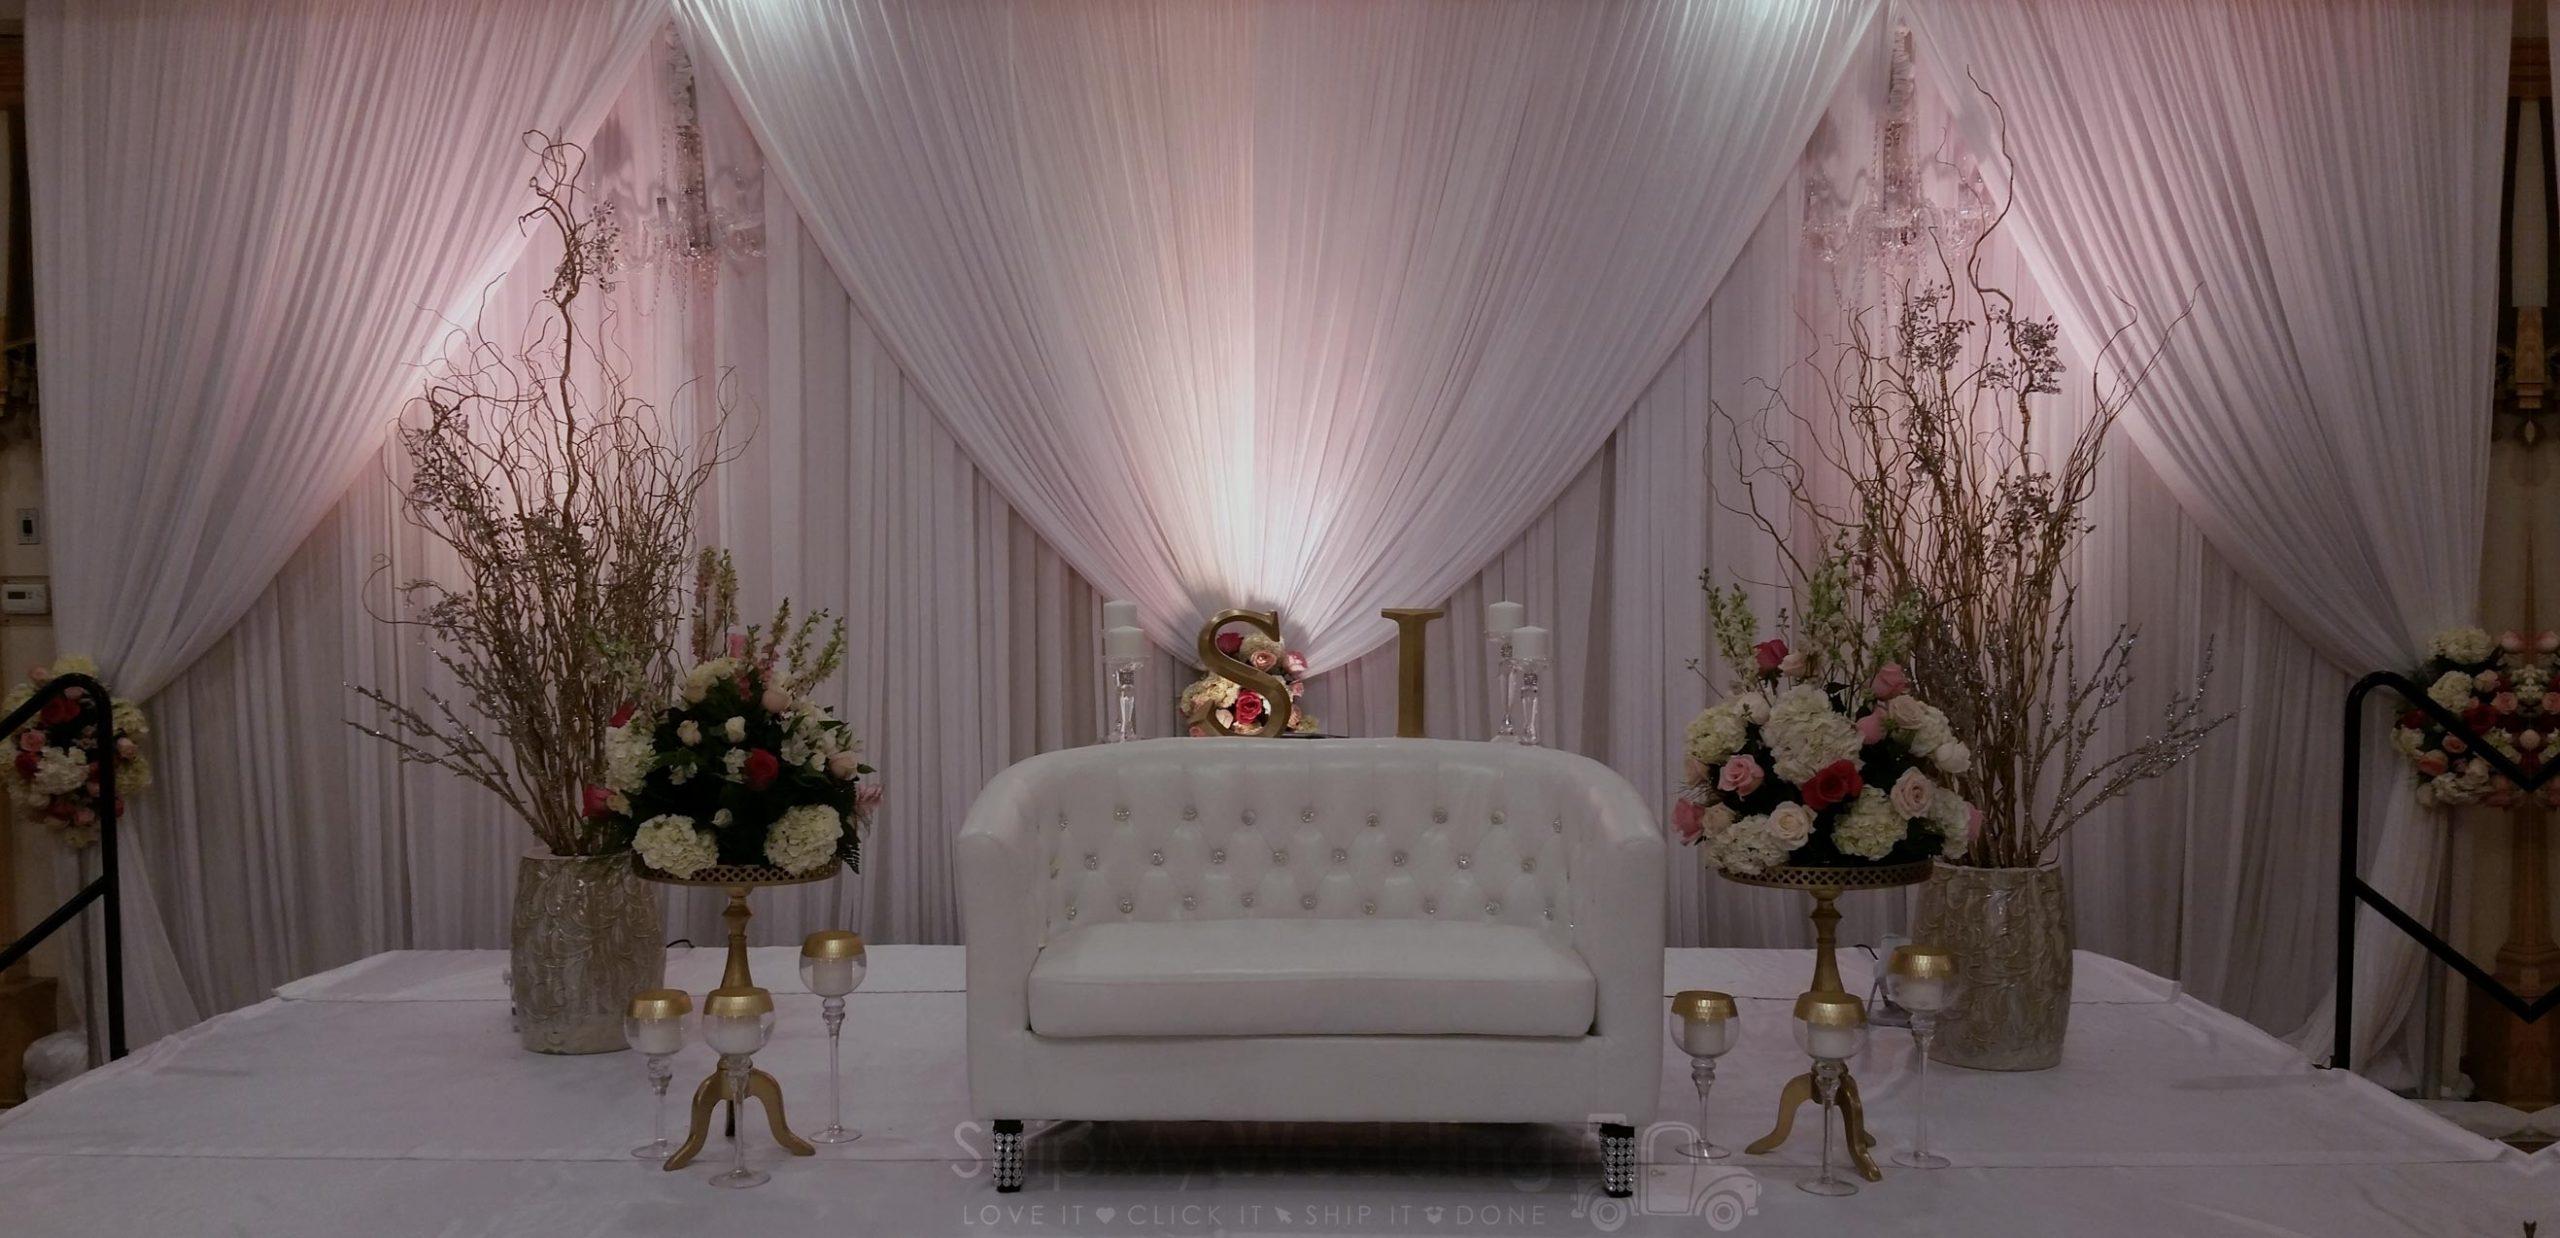 Diy Wedding Drapery Rent Double Valance Backdrop Ships Free